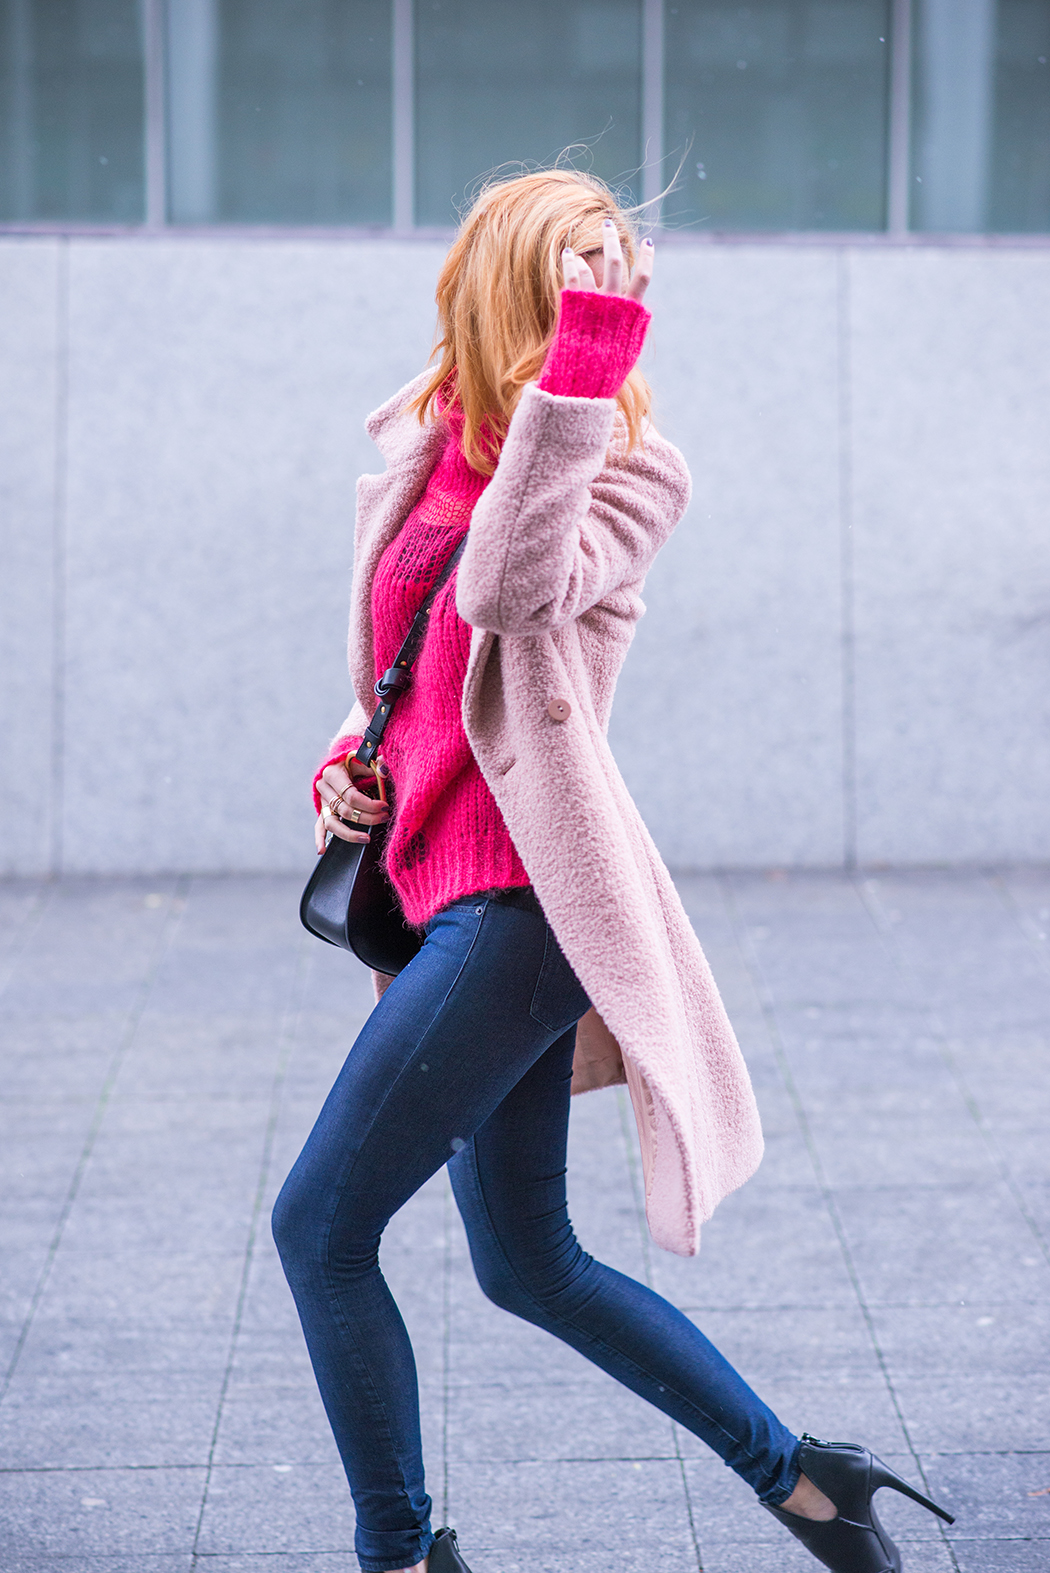 Fashionblog-Fashionblogger-Fashion-Blog-Blogger-Lifestyle-Chloe_Hudson-Twin-Set-rosa-Mantel-IRO-pink-pullover-erdbeerblond-6-web